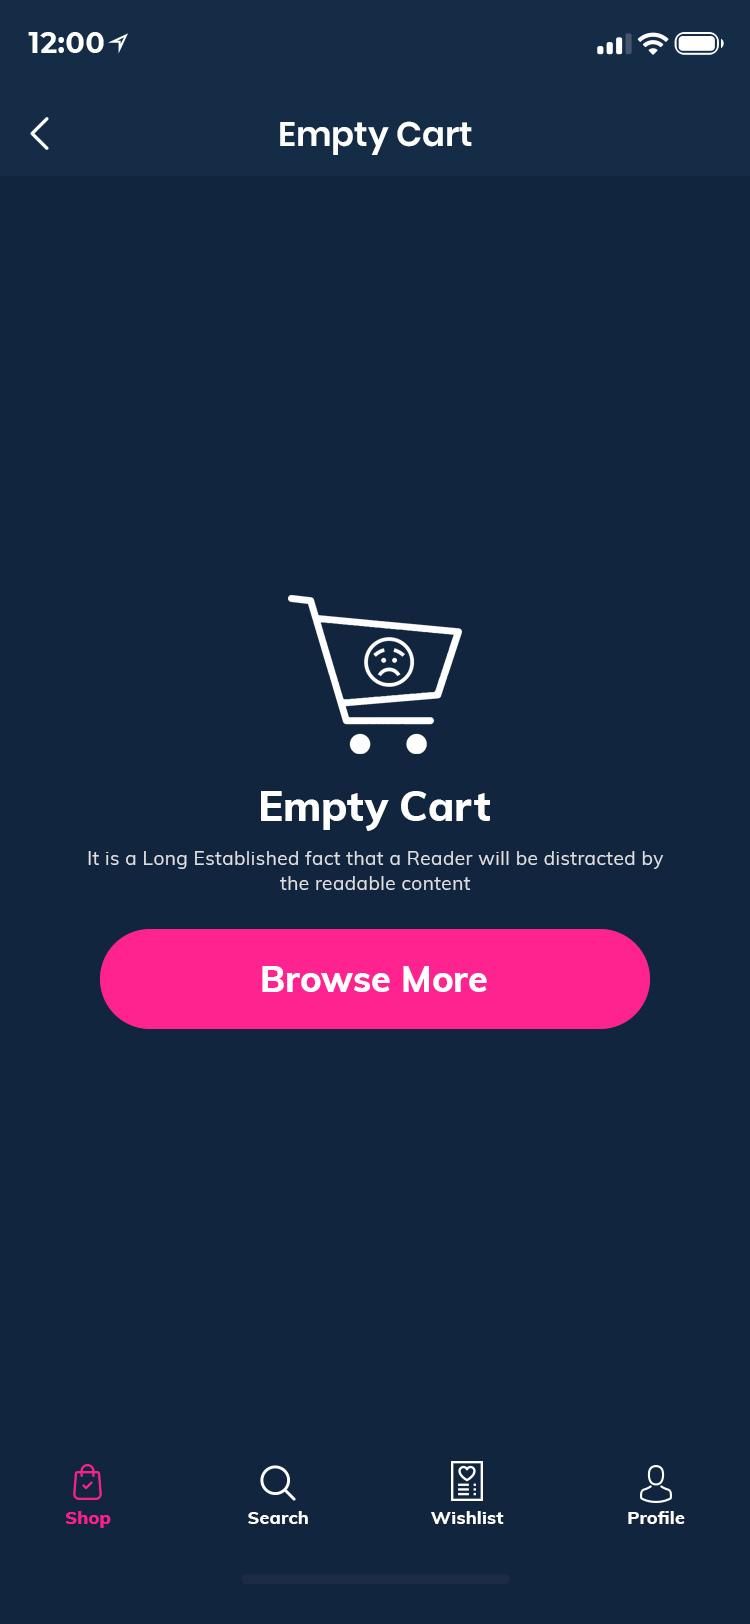 mobile-app-ecommerce-14